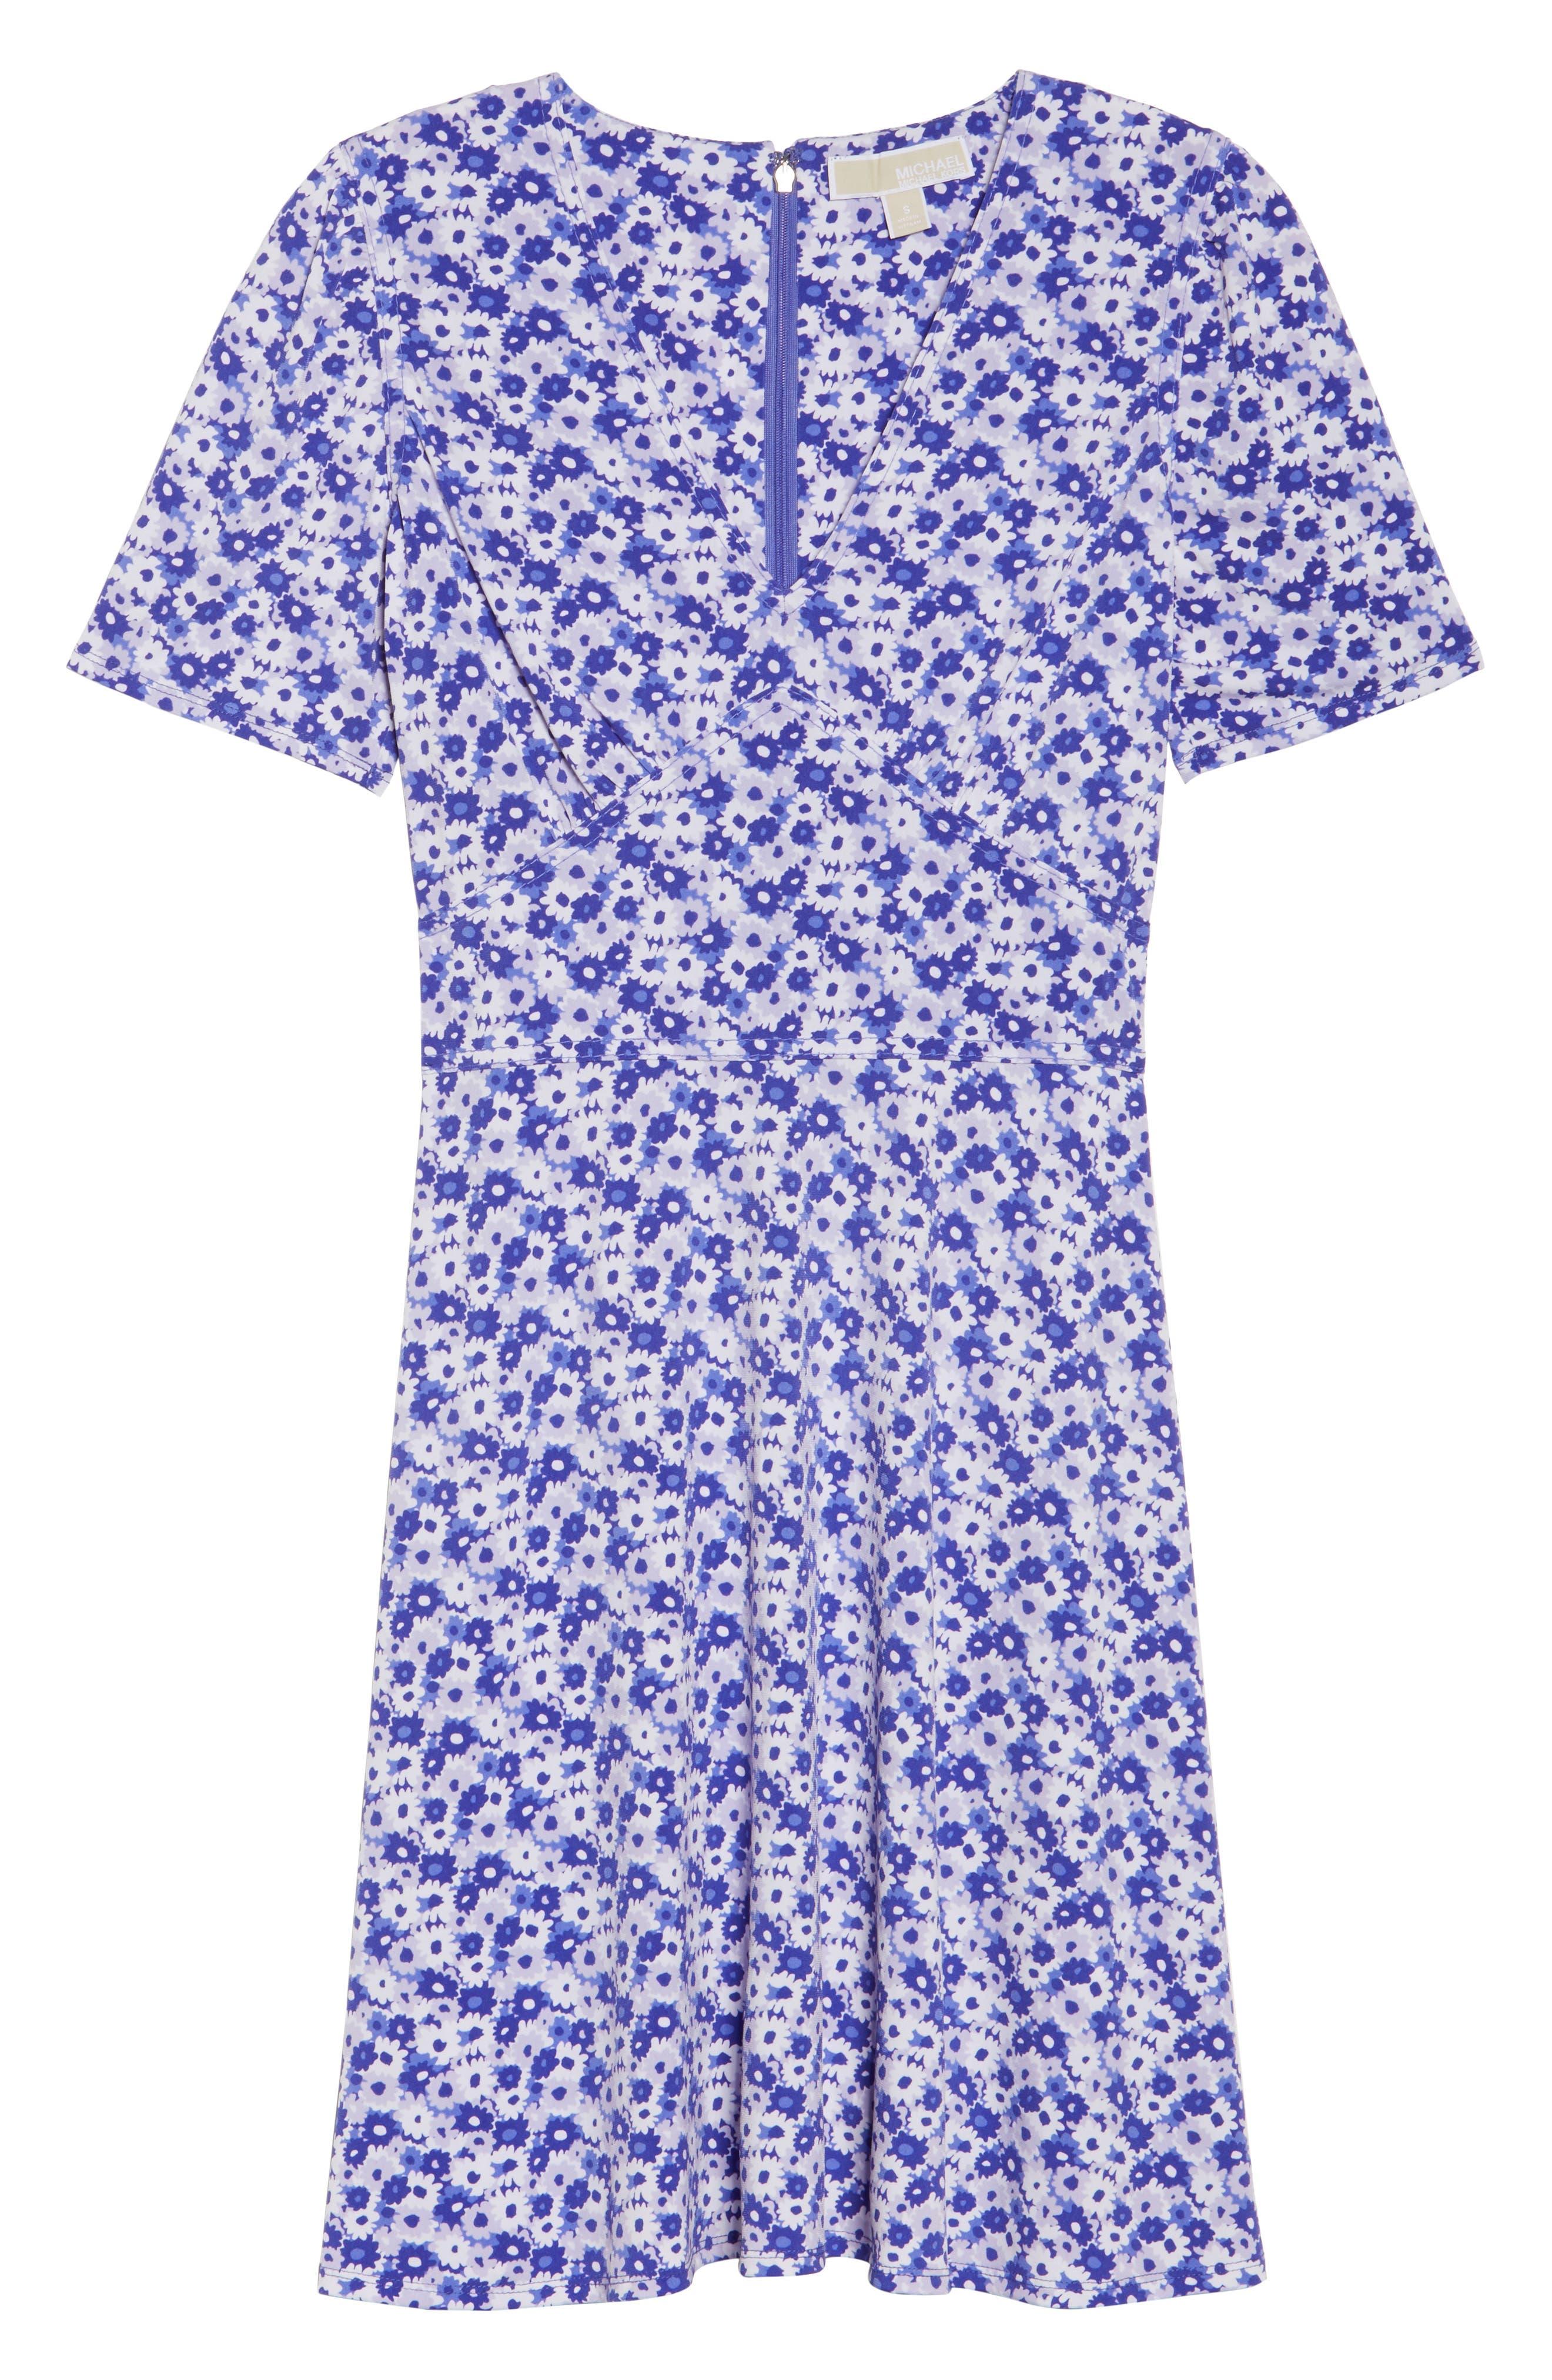 Floral Fit & Flare Dress,                             Alternate thumbnail 6, color,                             580